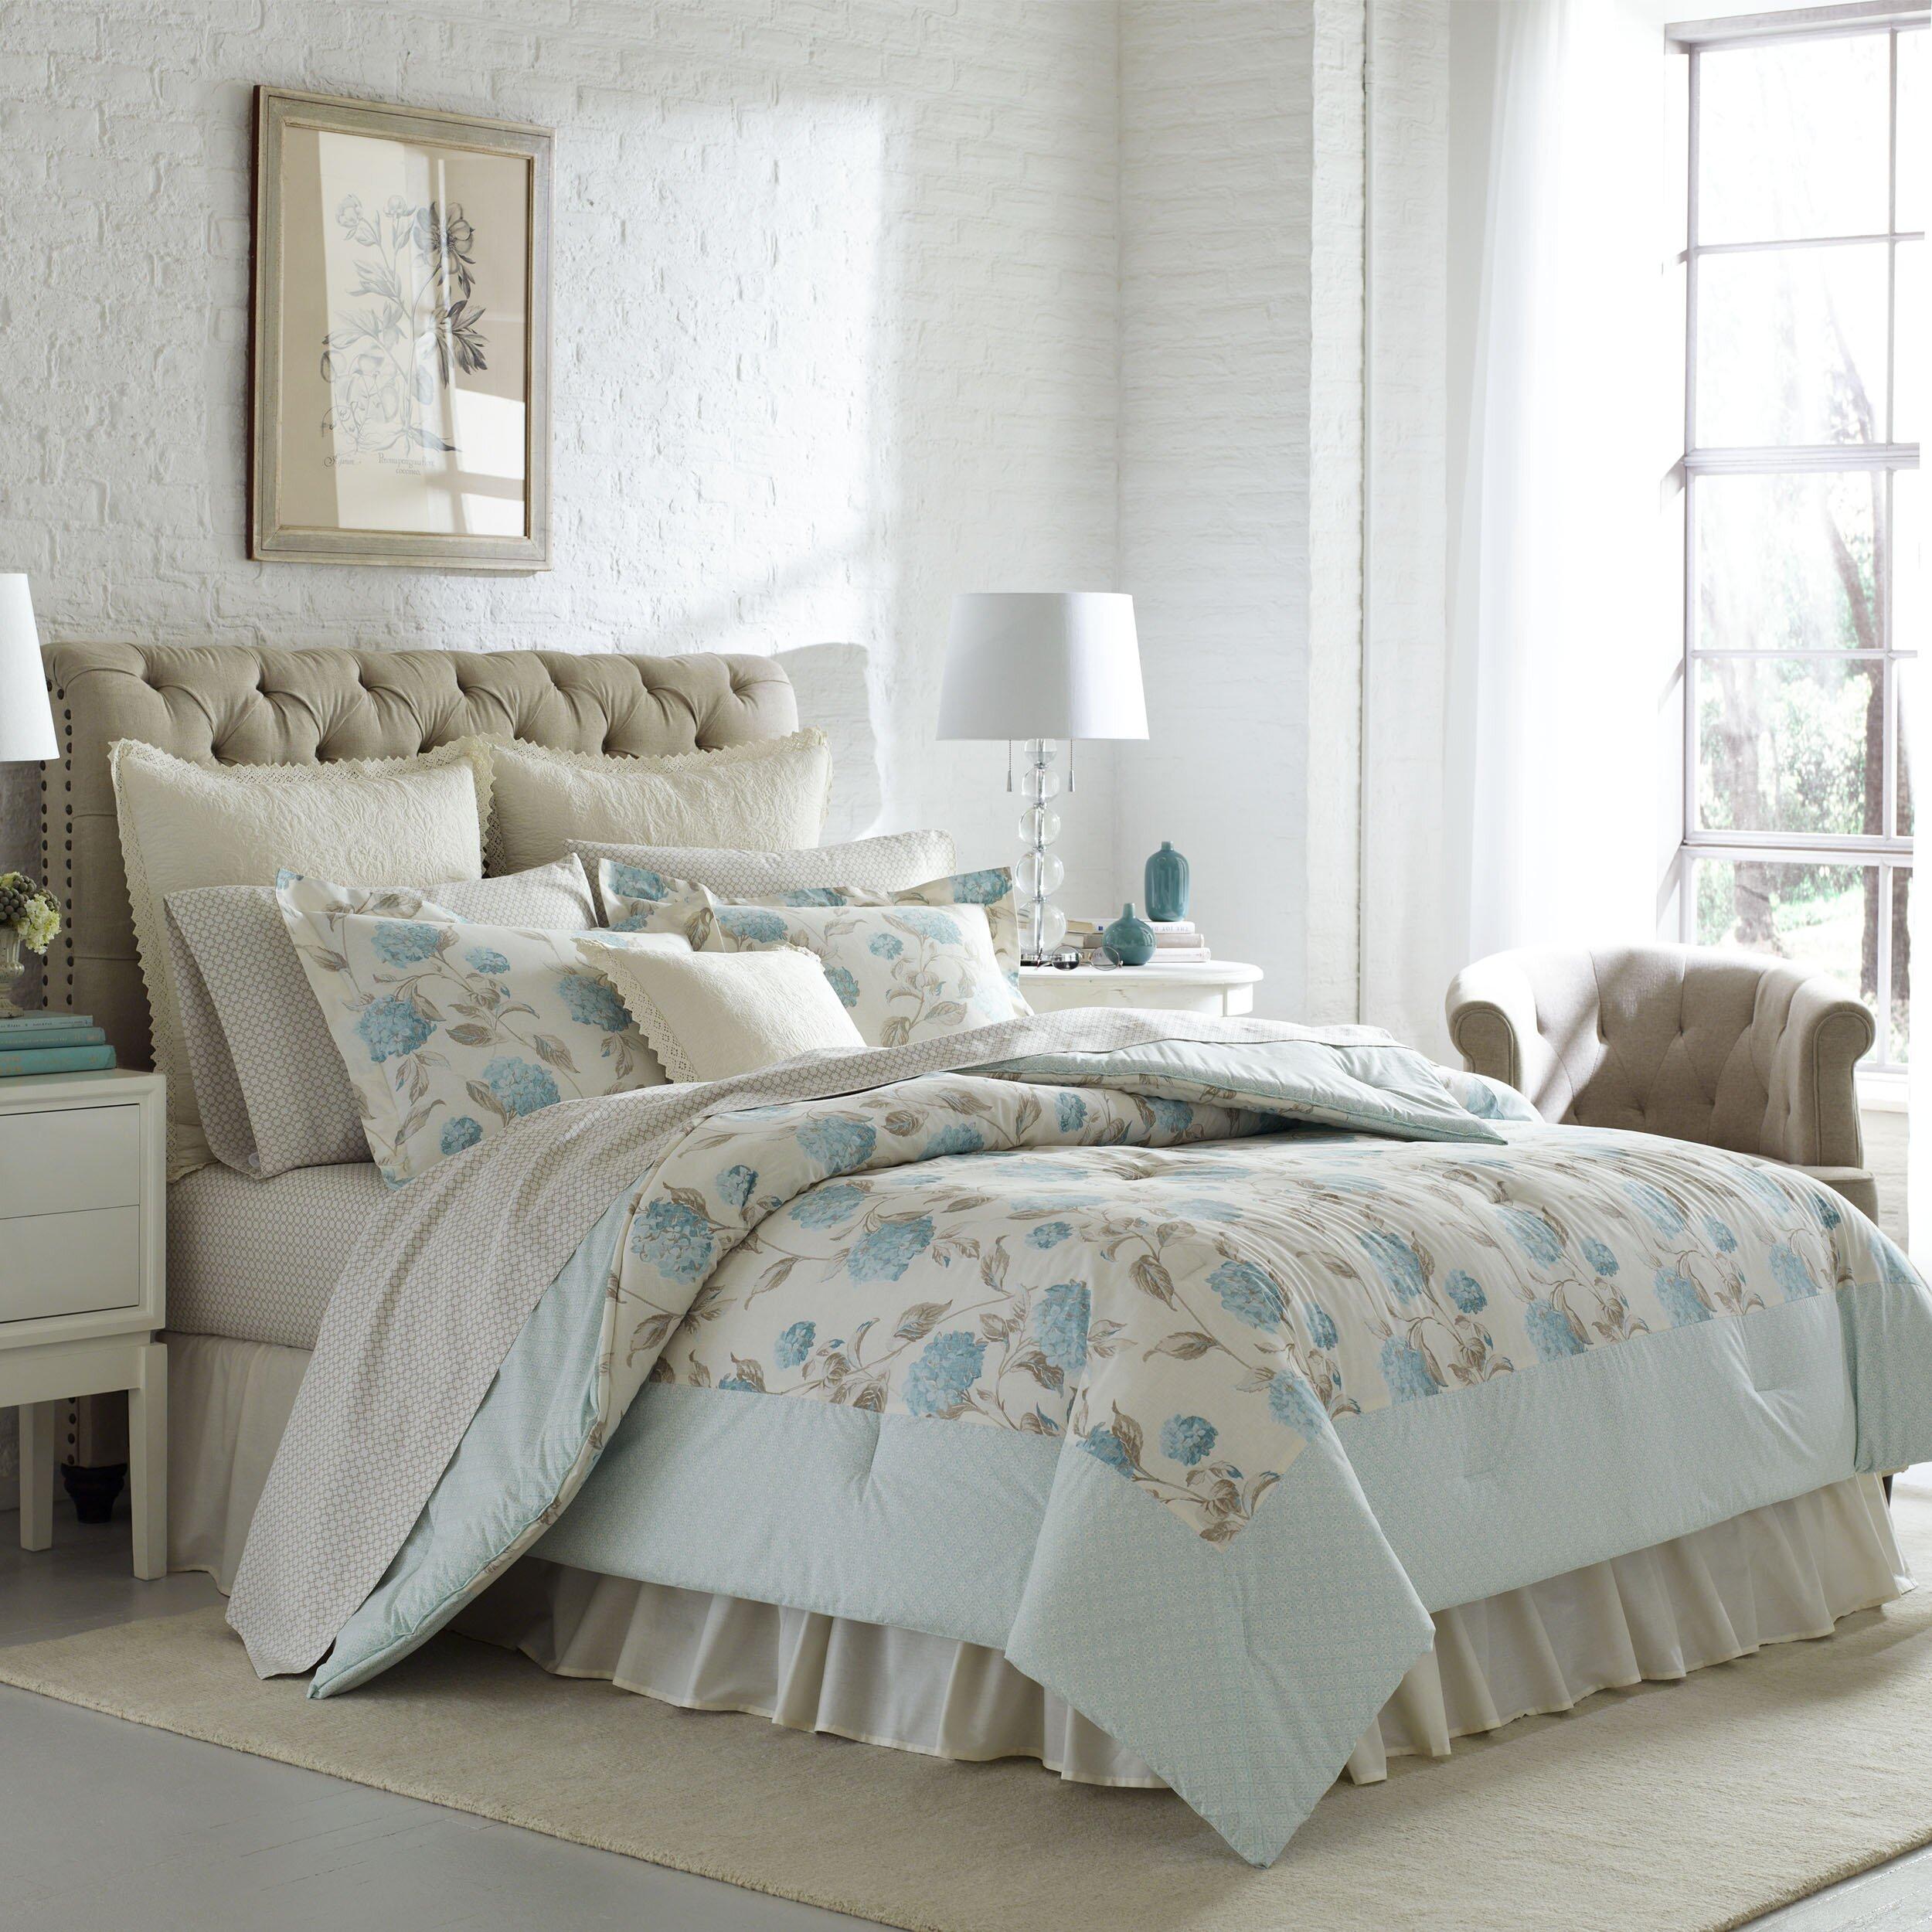 Comforter Sets Queen Ashley: Laura Ashley Home Baylie Comforter Set